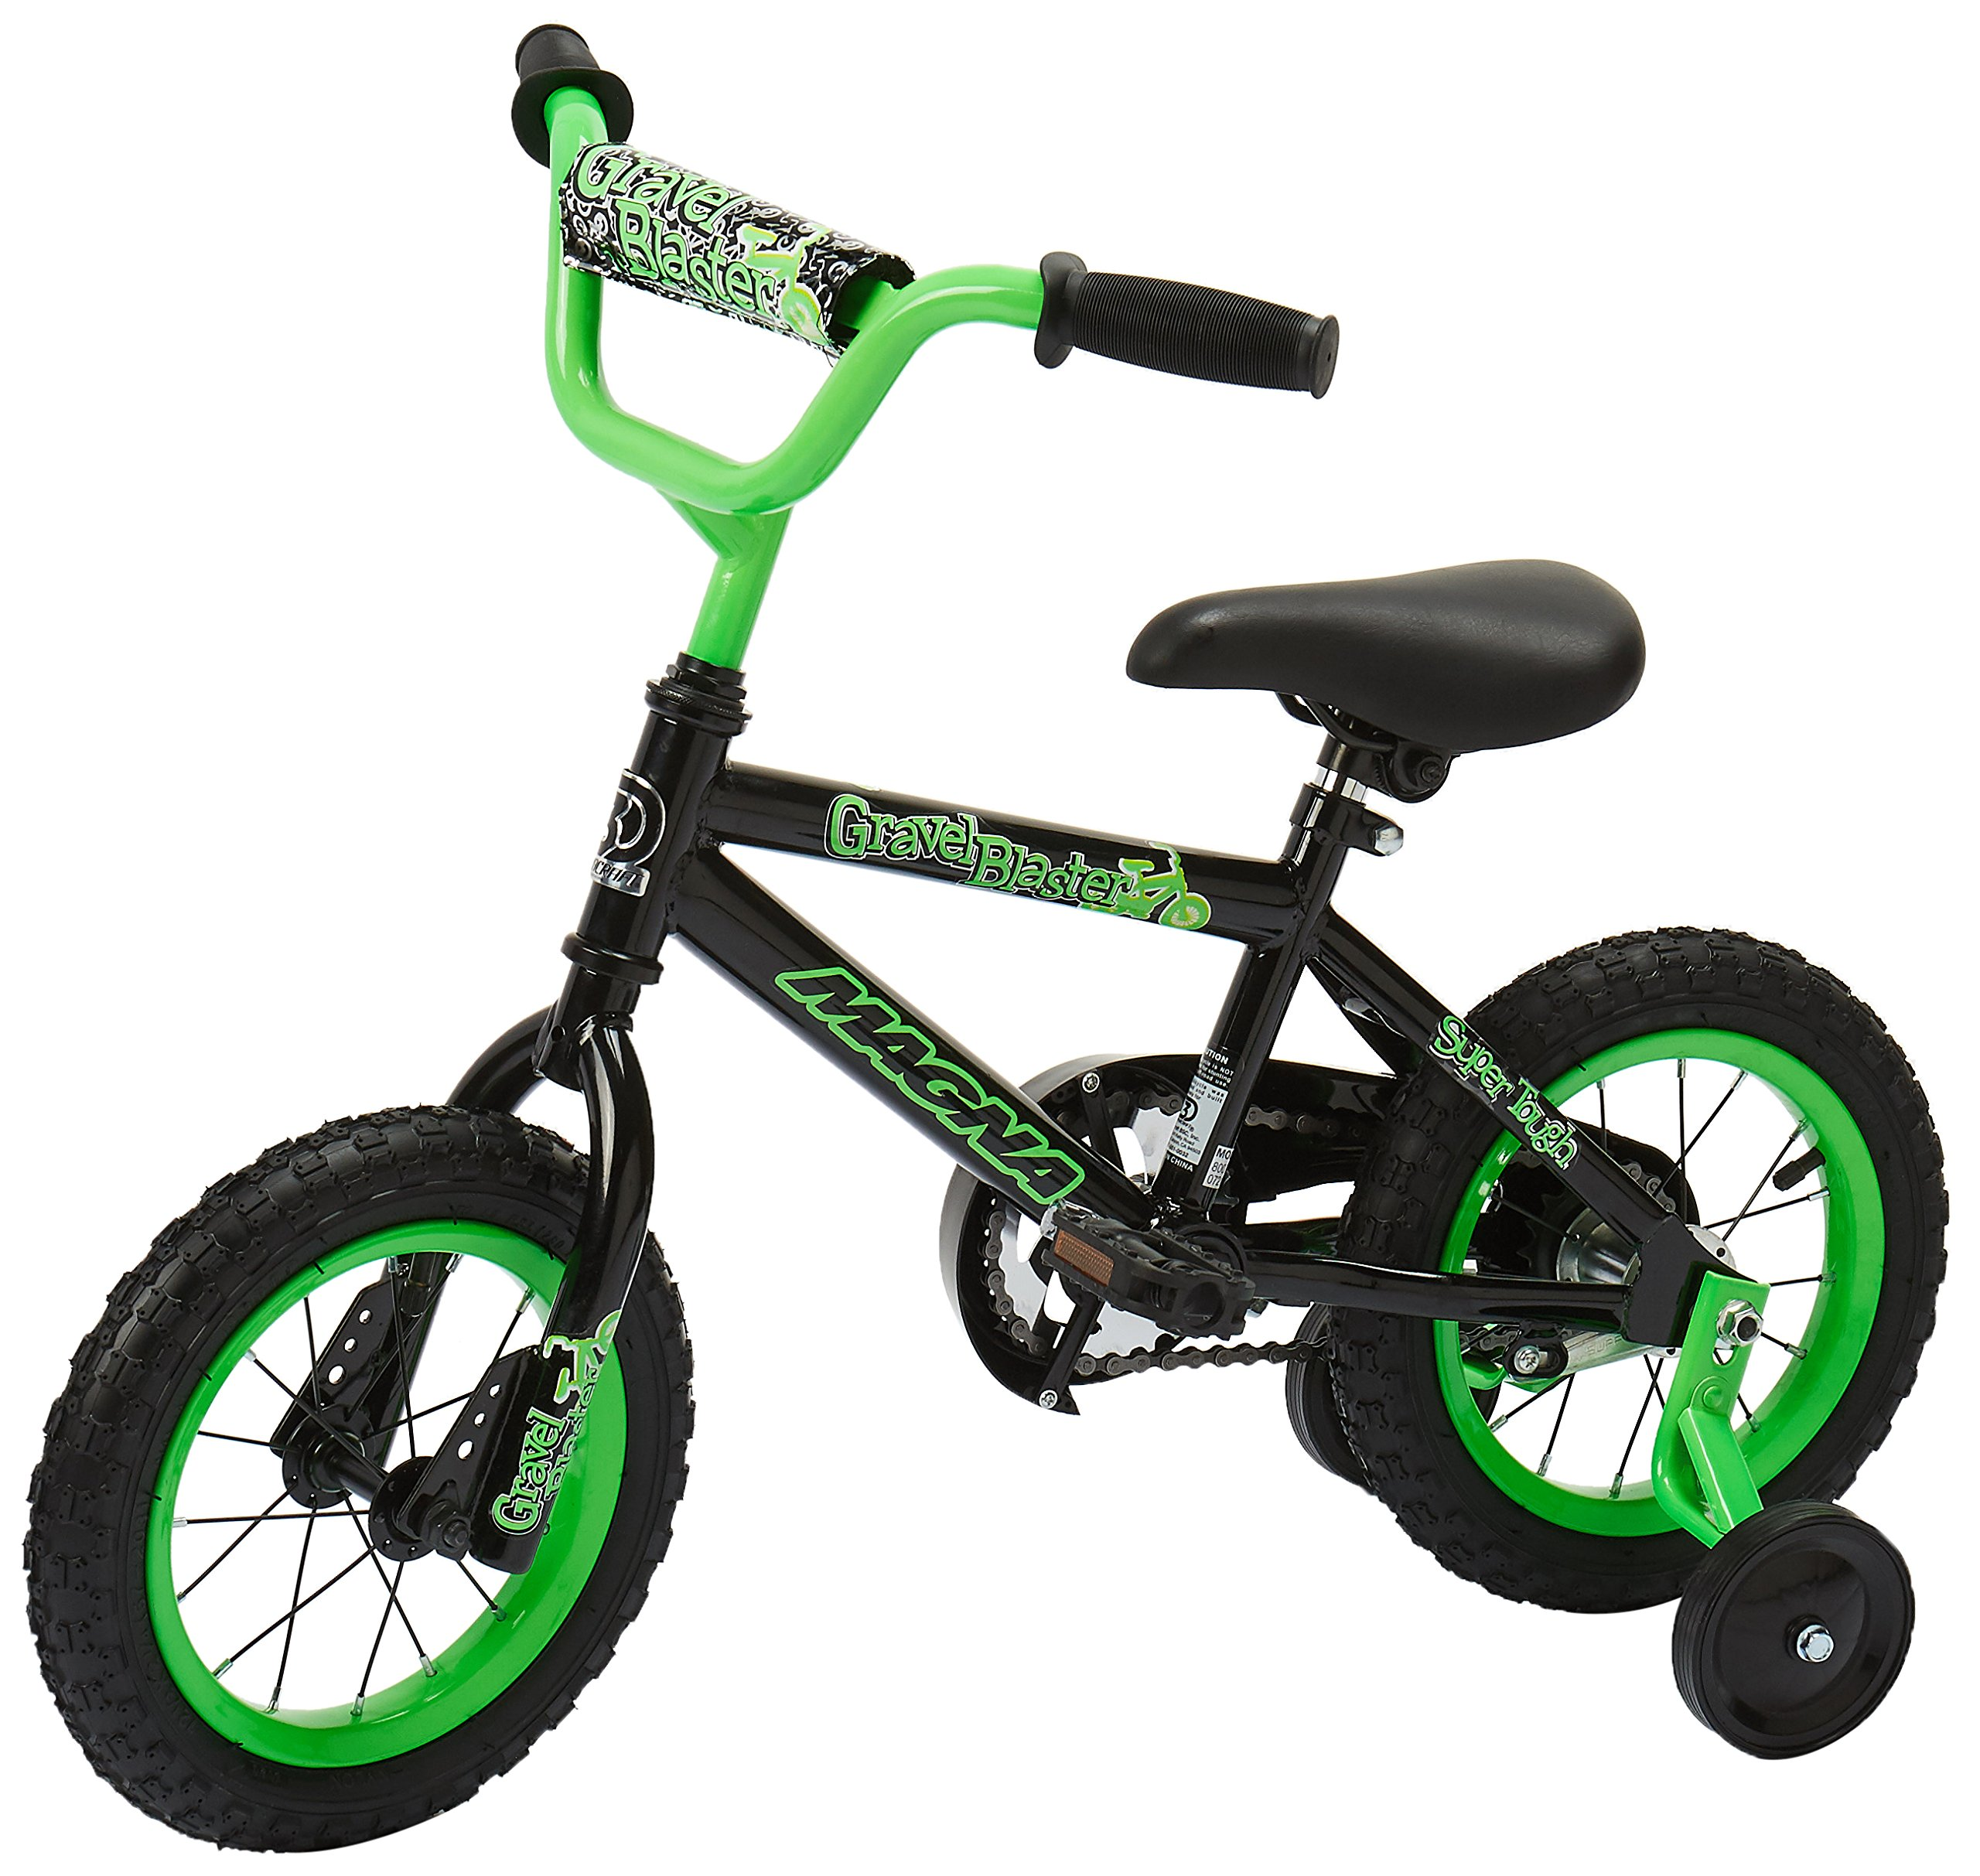 Dynacraft Magna Gravel Blaster Boys BMX Street/Dirt Bike 12'', Black/Green